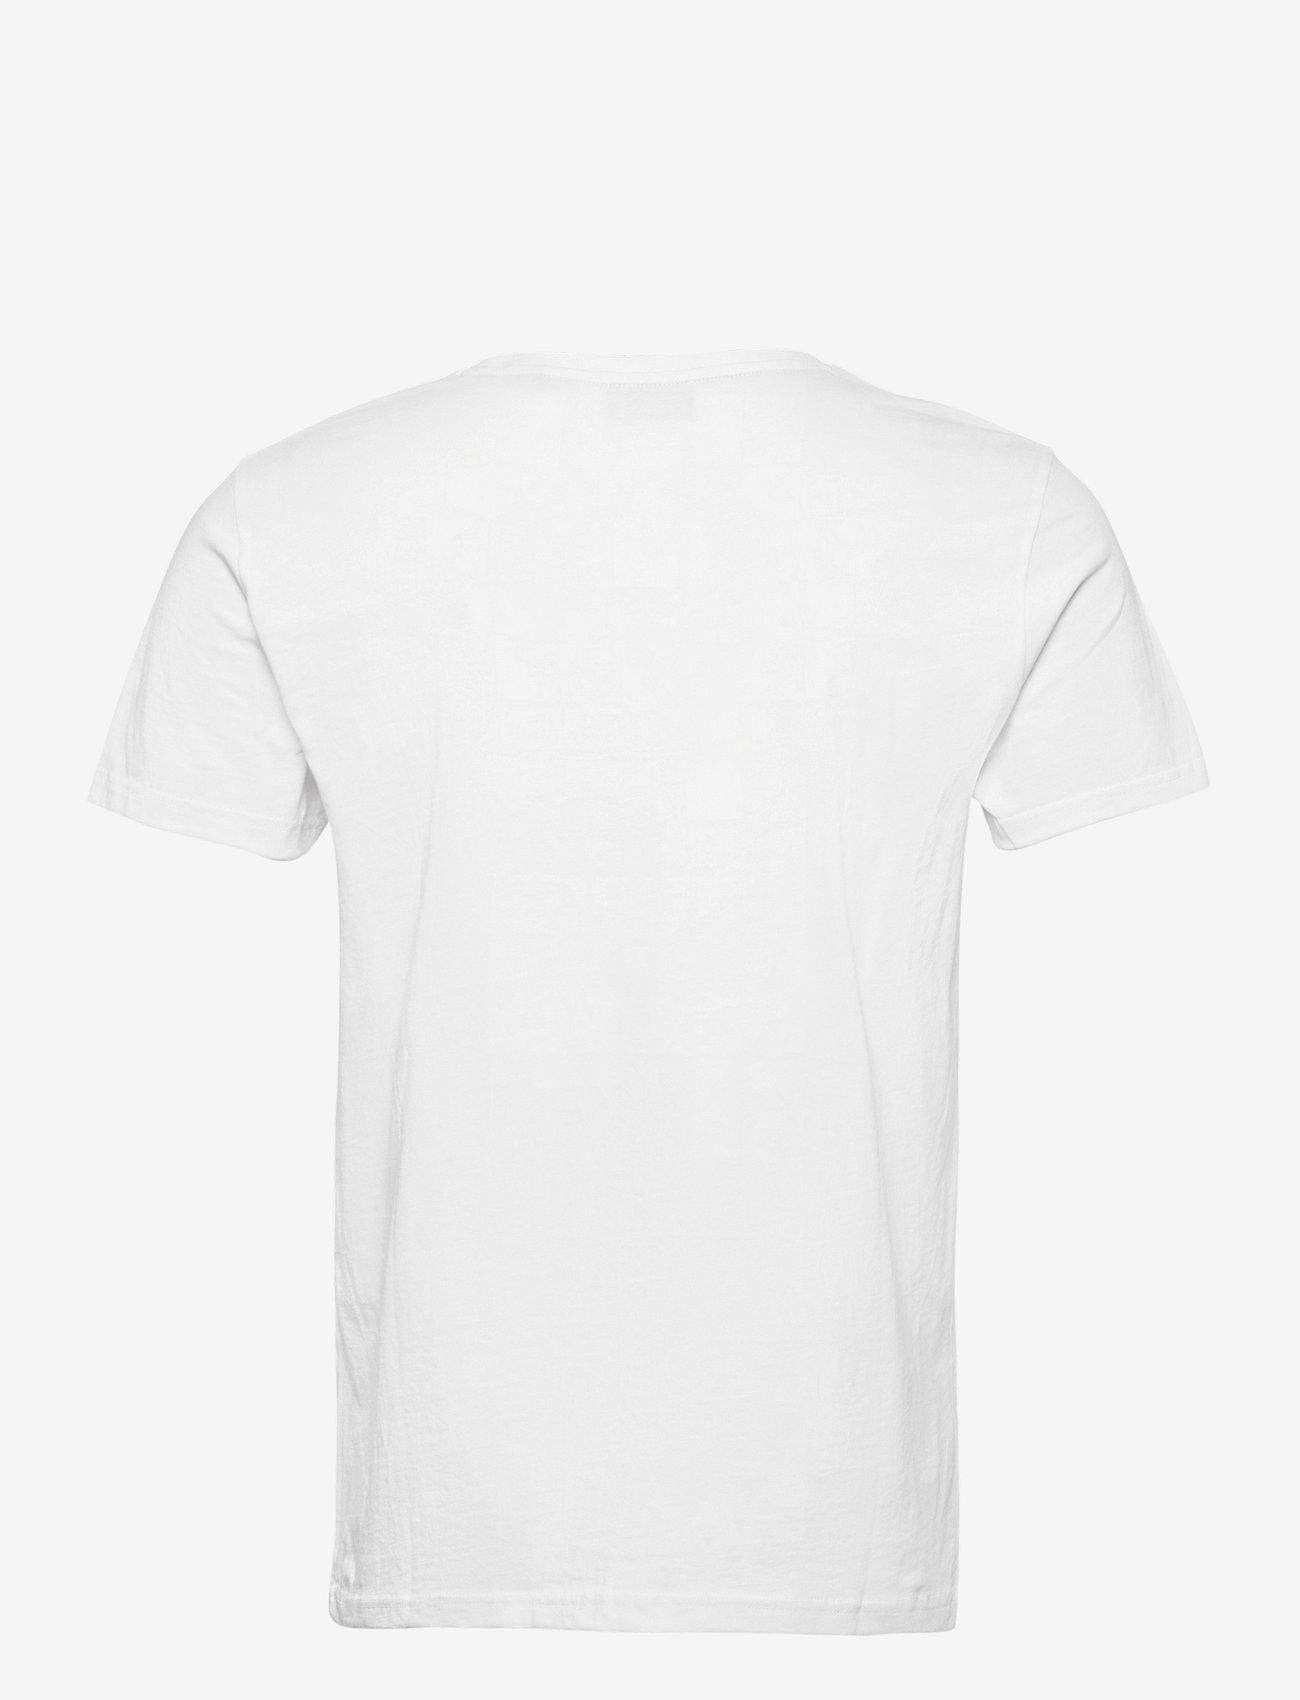 GANT - LOCK UP SS T-SHIRT - short-sleeved t-shirts - white - 1